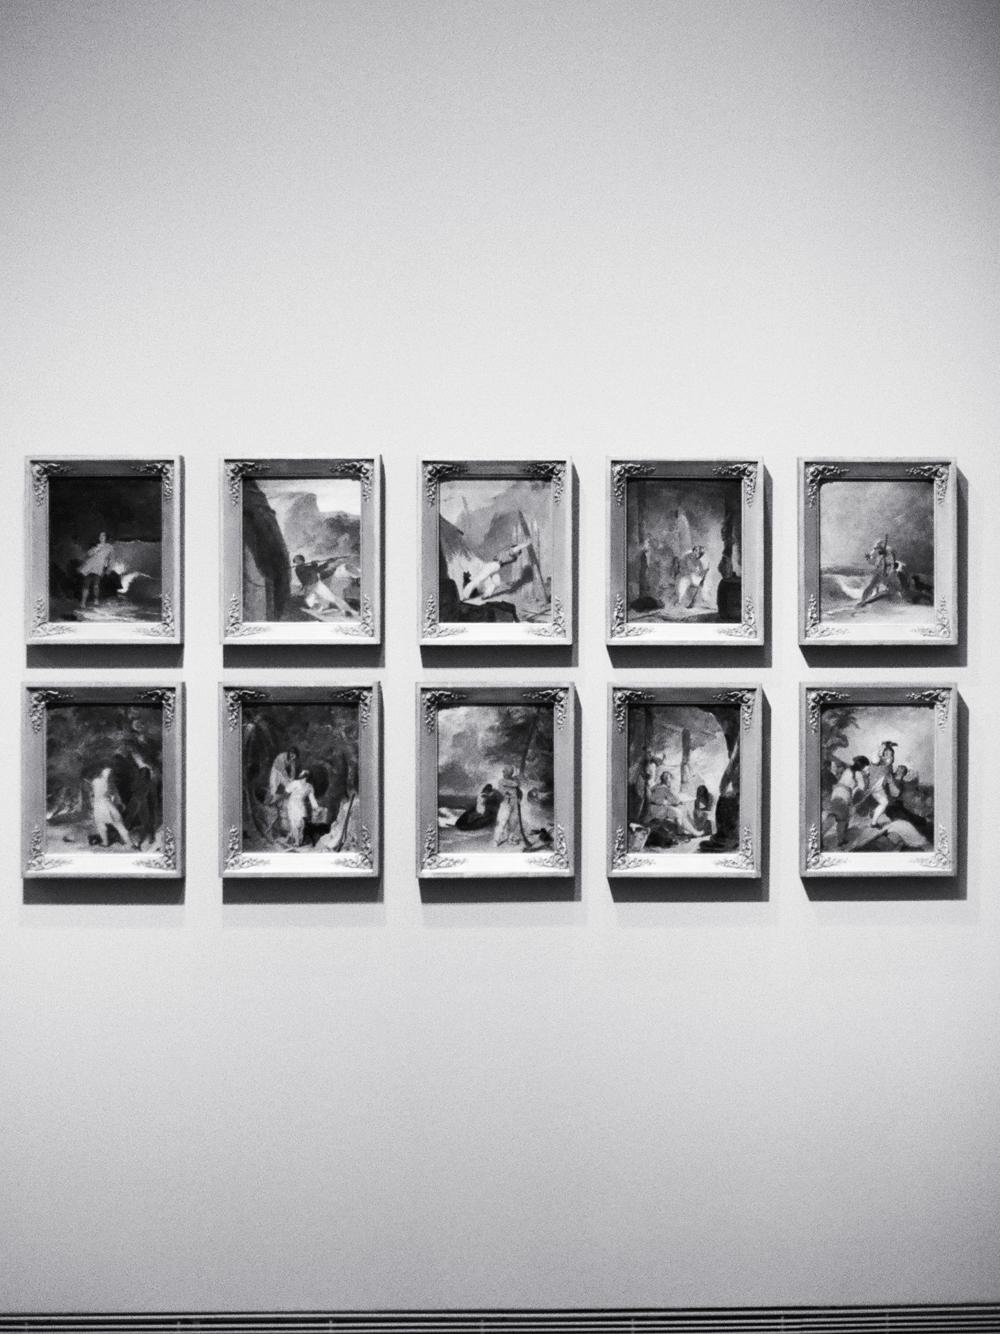 MFAH-christine-gosch-film-photographer-fine-art-film-houston-photographer-museum-portraits-sculptures-photography-analog-canonAE1-4.jpg